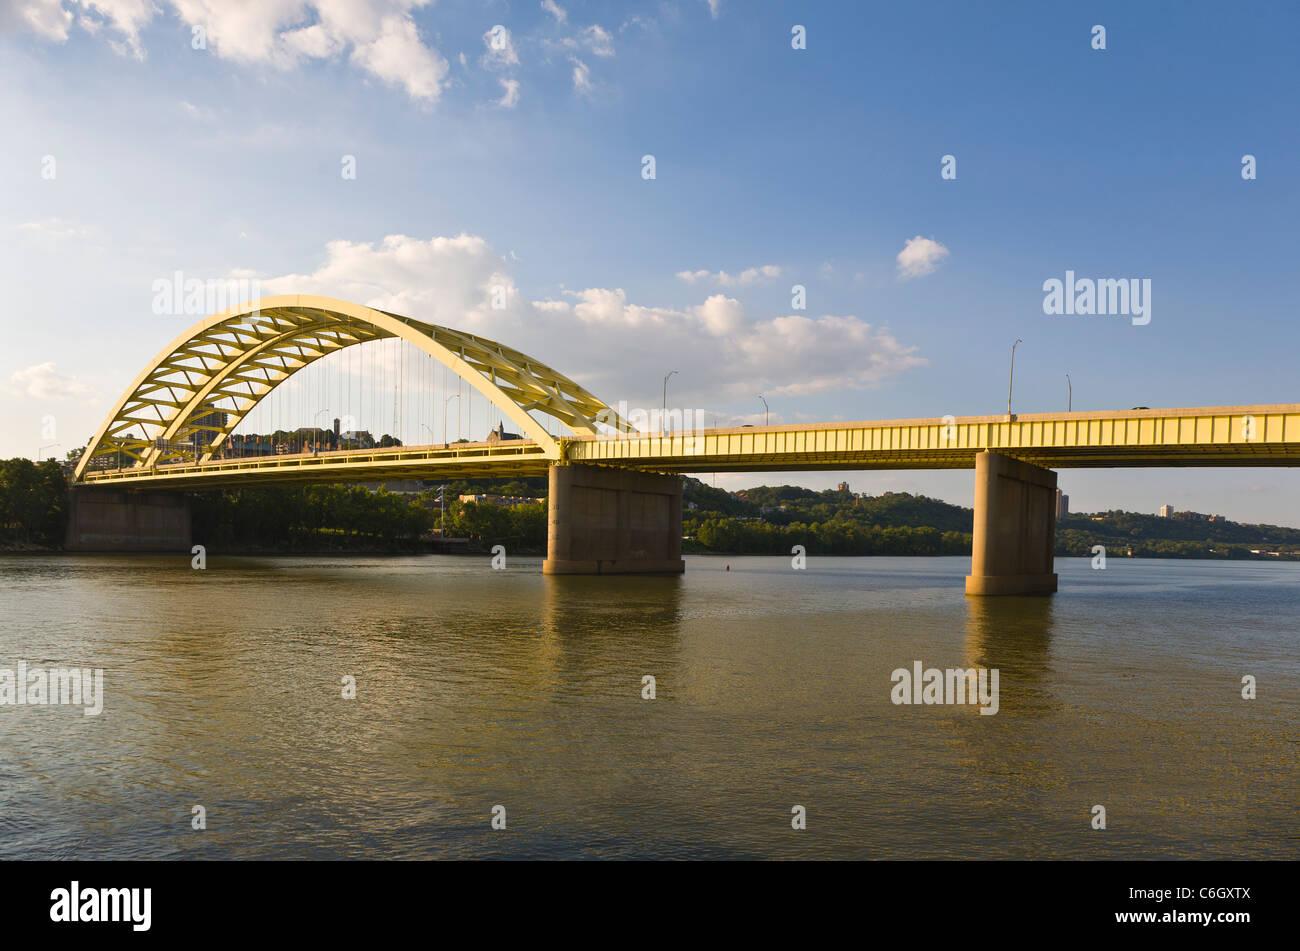 ohio river big mac bridge stock photos ohio river big mac bridge